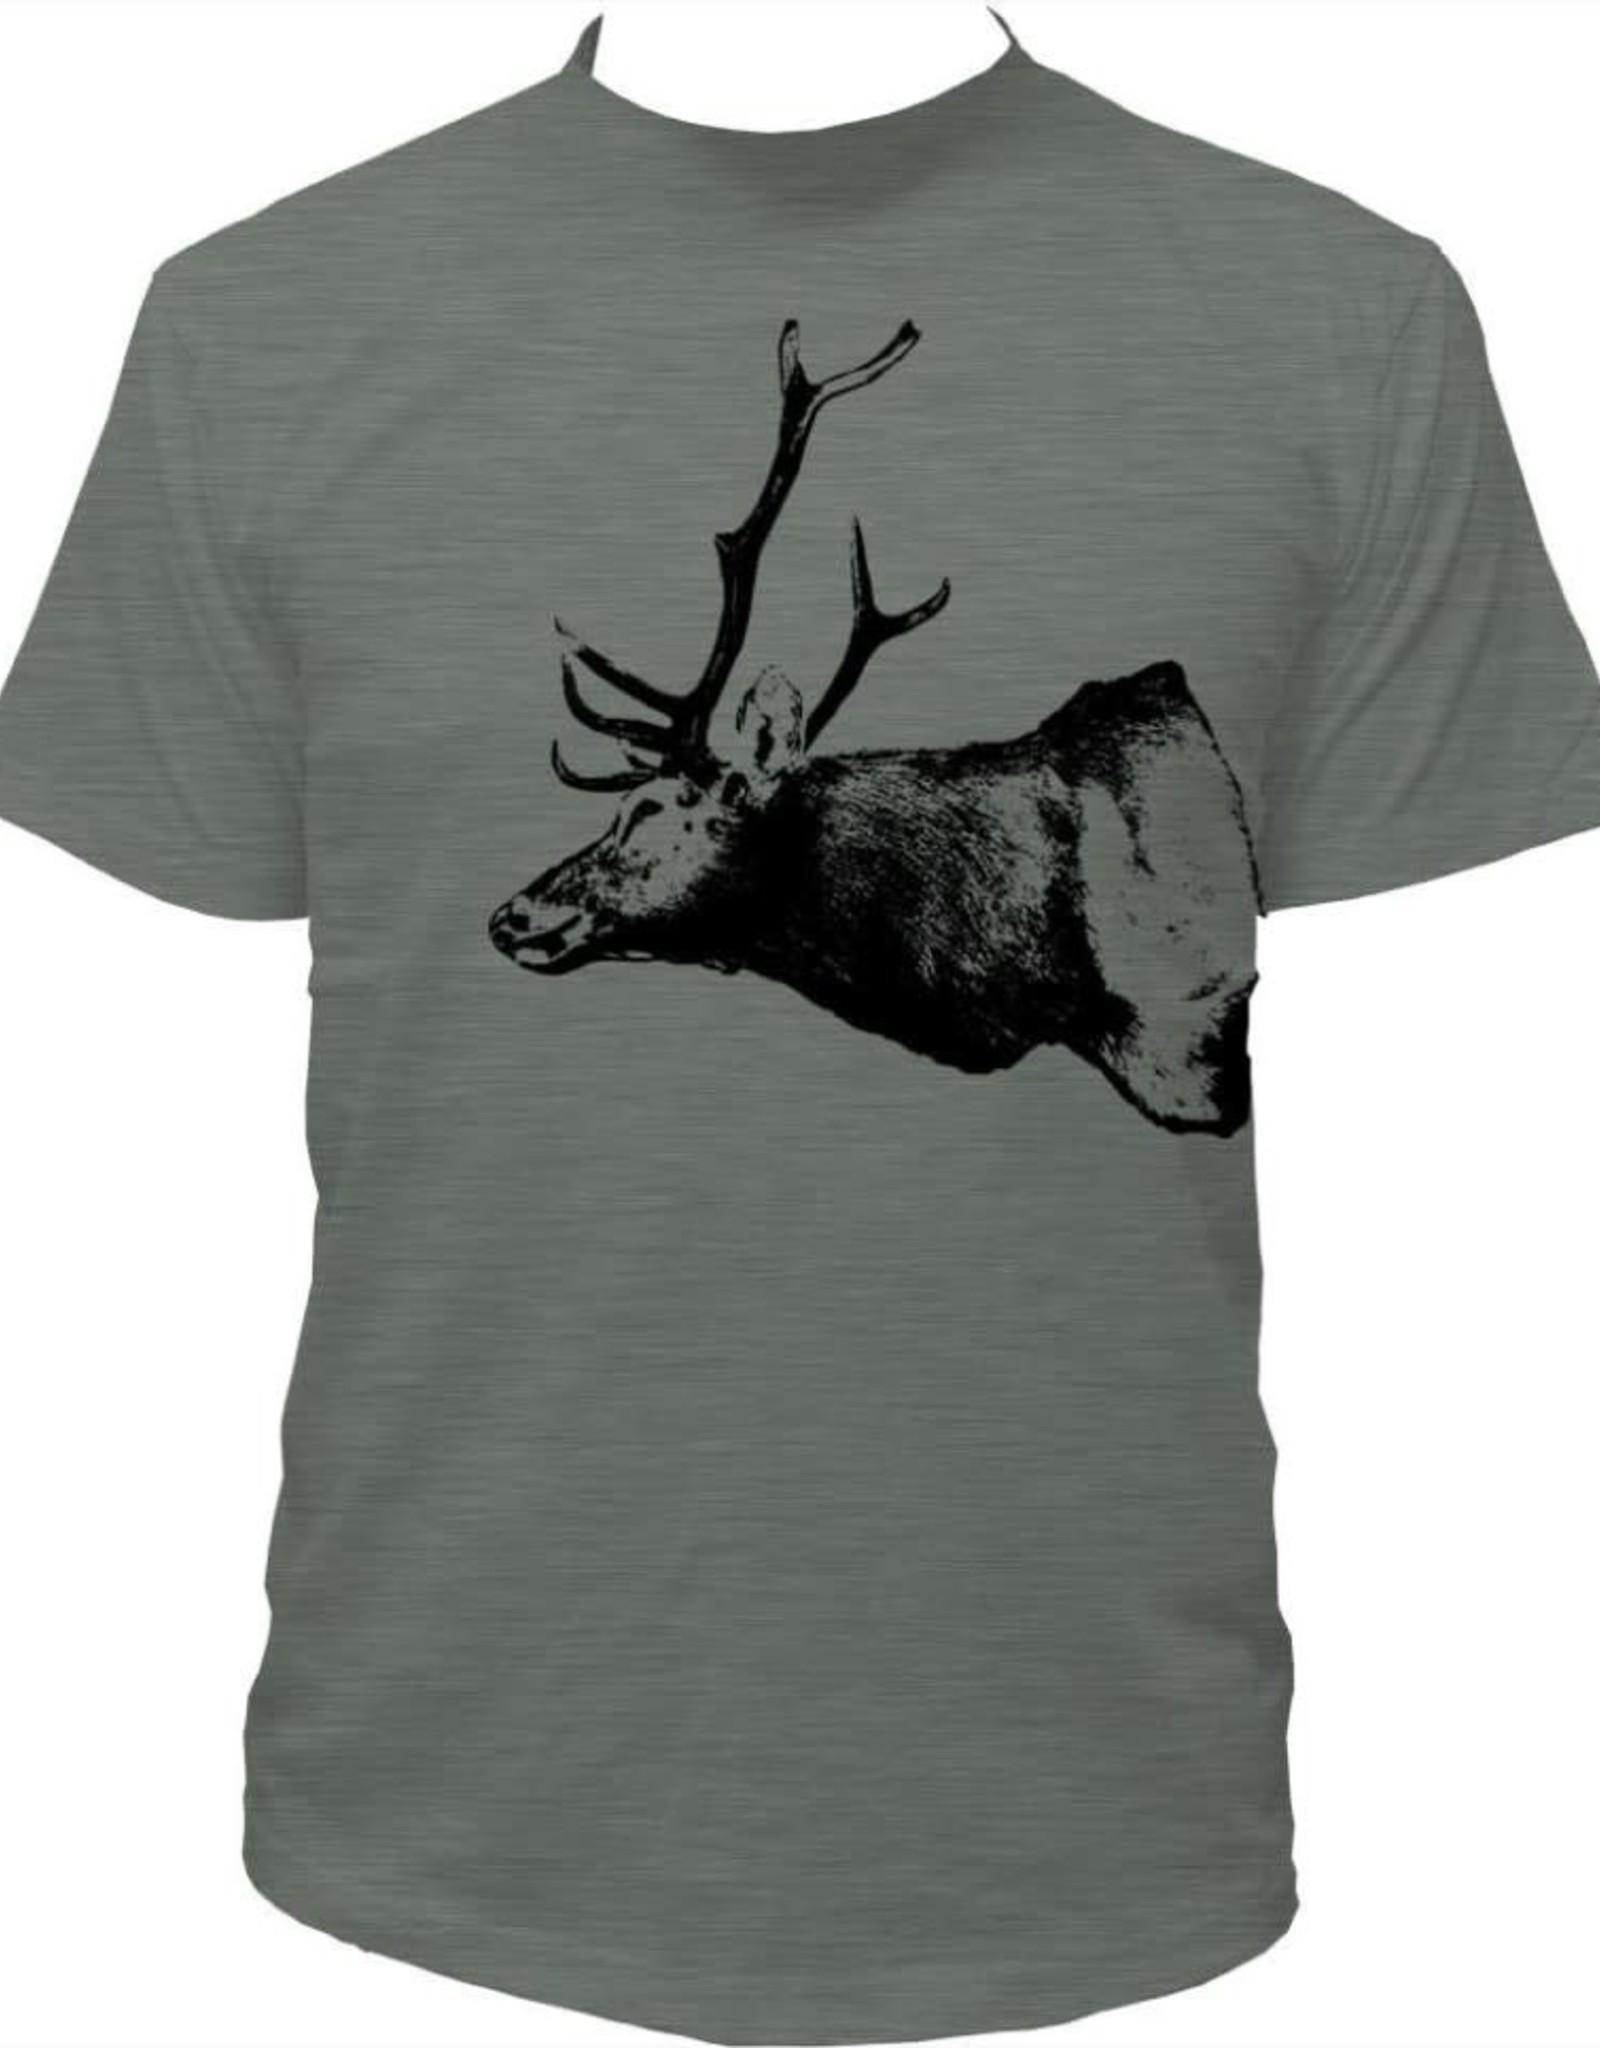 Tresnormale T-Shirt Homme Tresnormale Cerf Vert